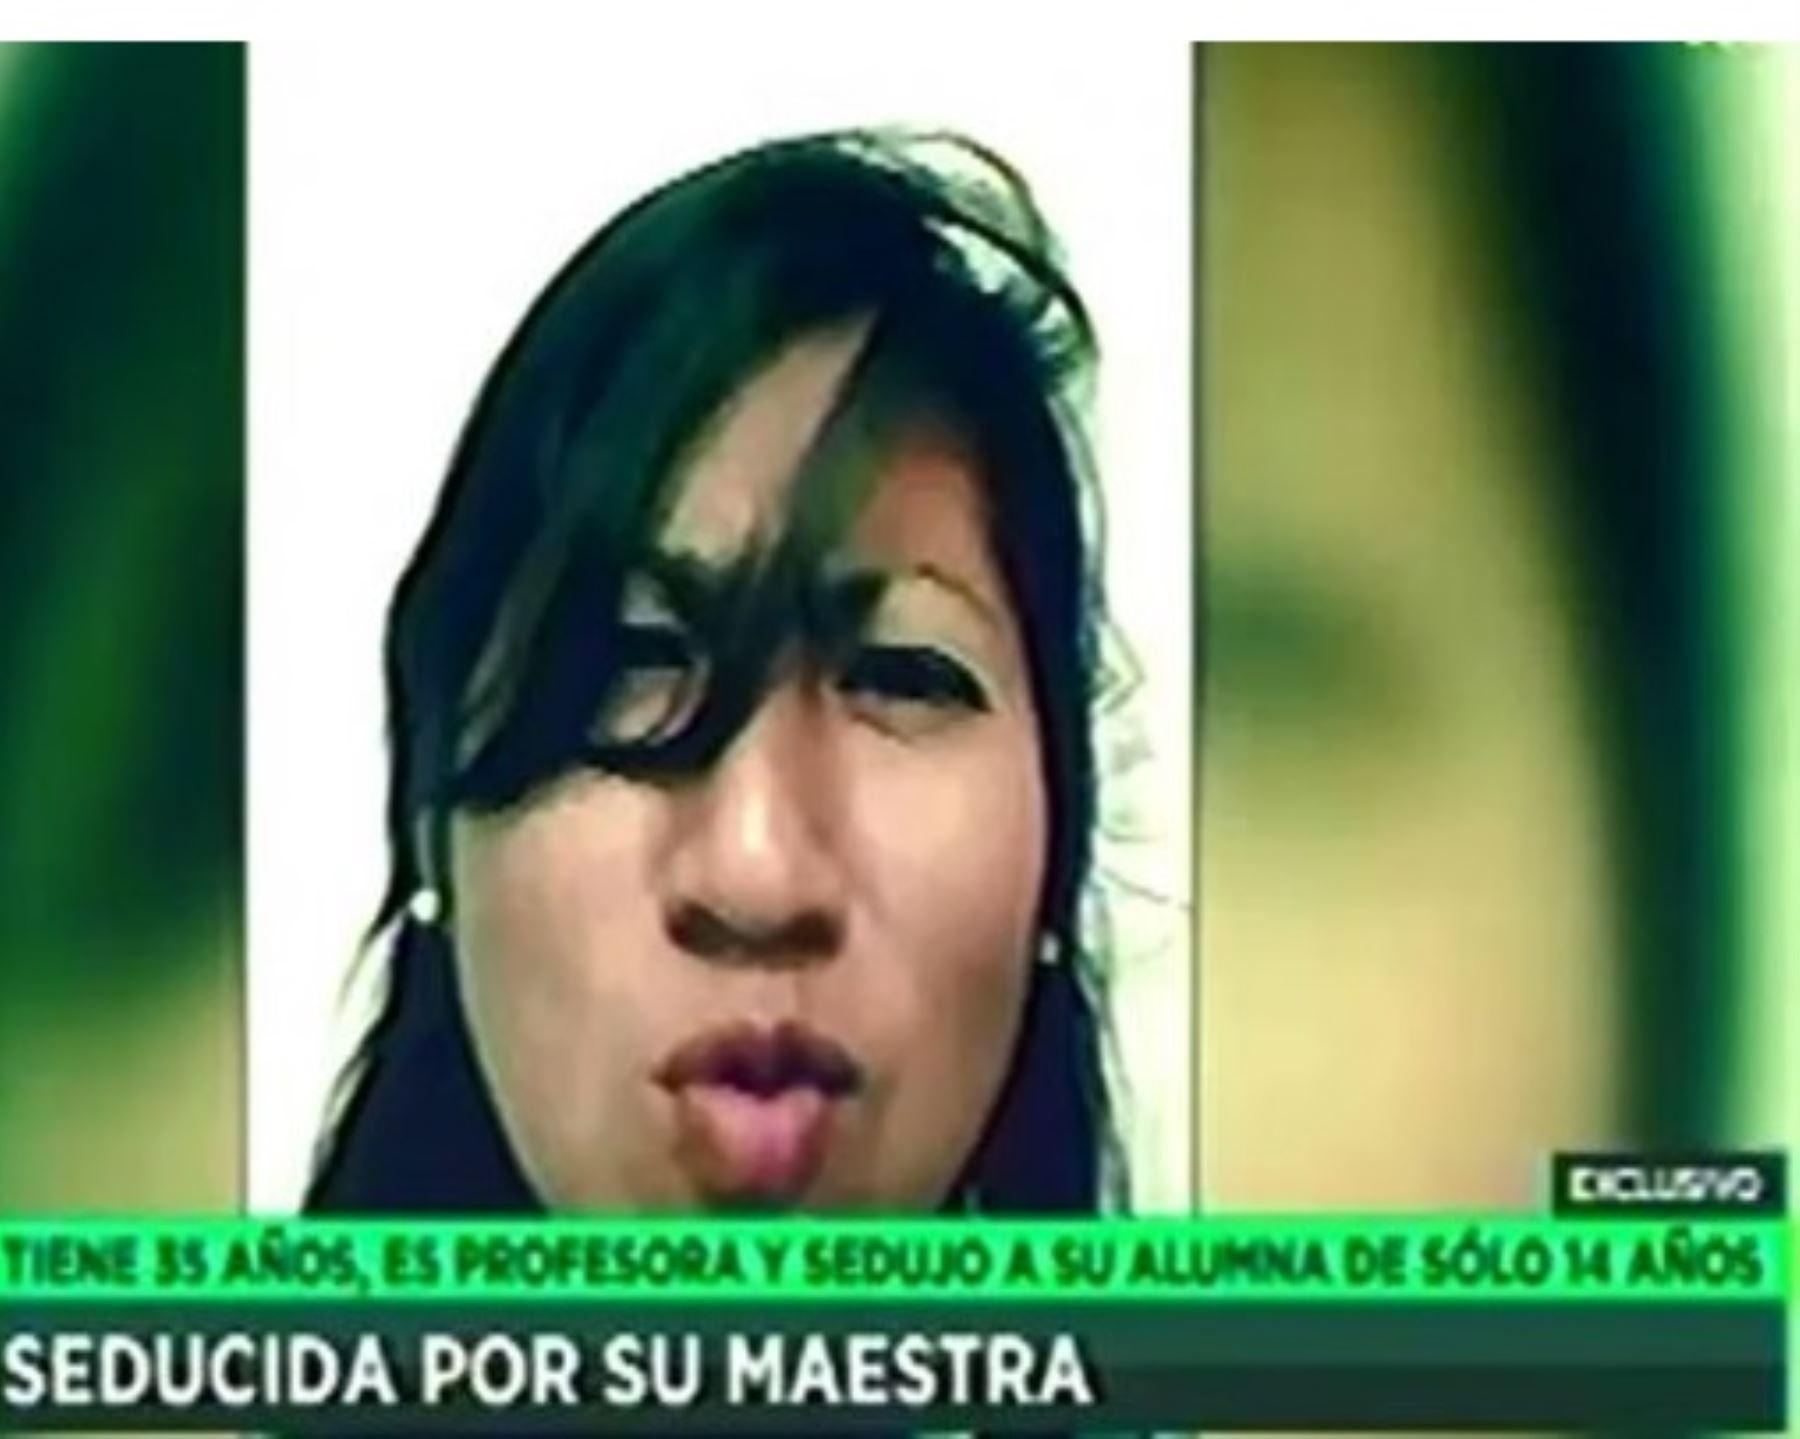 Profesora Jessica Karina Sierra Salas, acusada de acoso sexual a alumna menor de edad. Foto: Captura TV